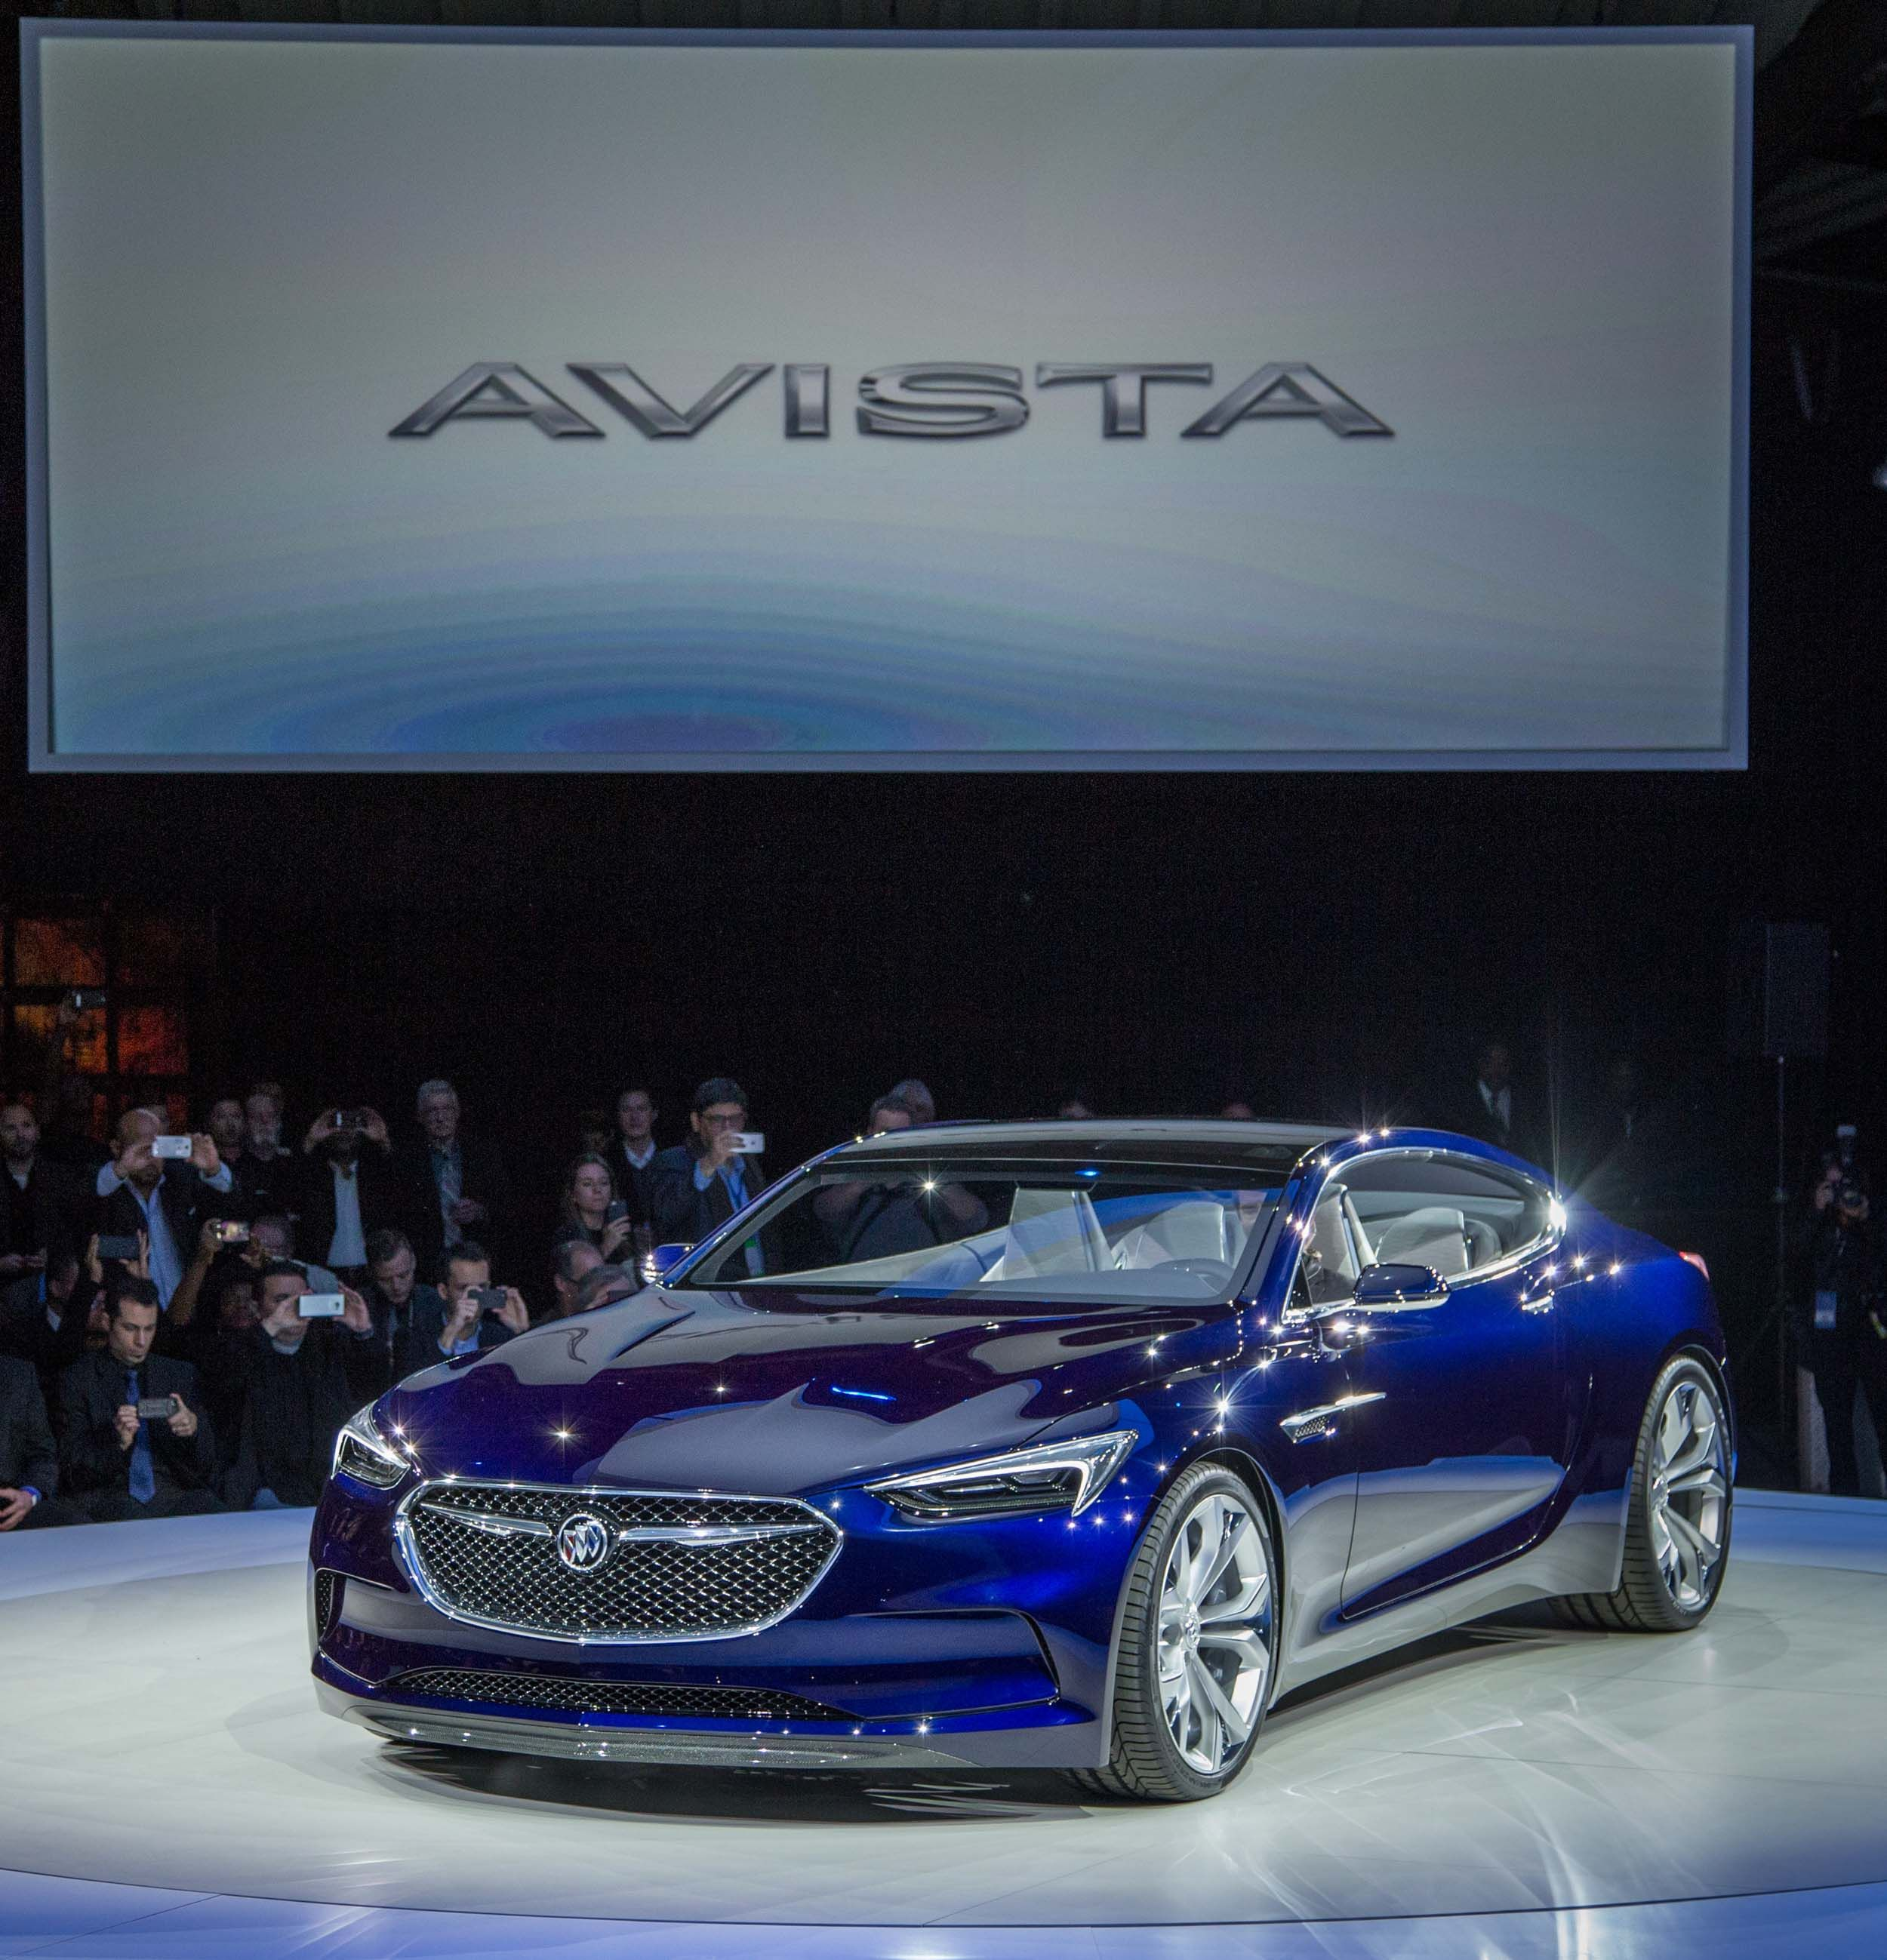 11 Buick Avista Ideas Buick Avista Buick Concept Cars